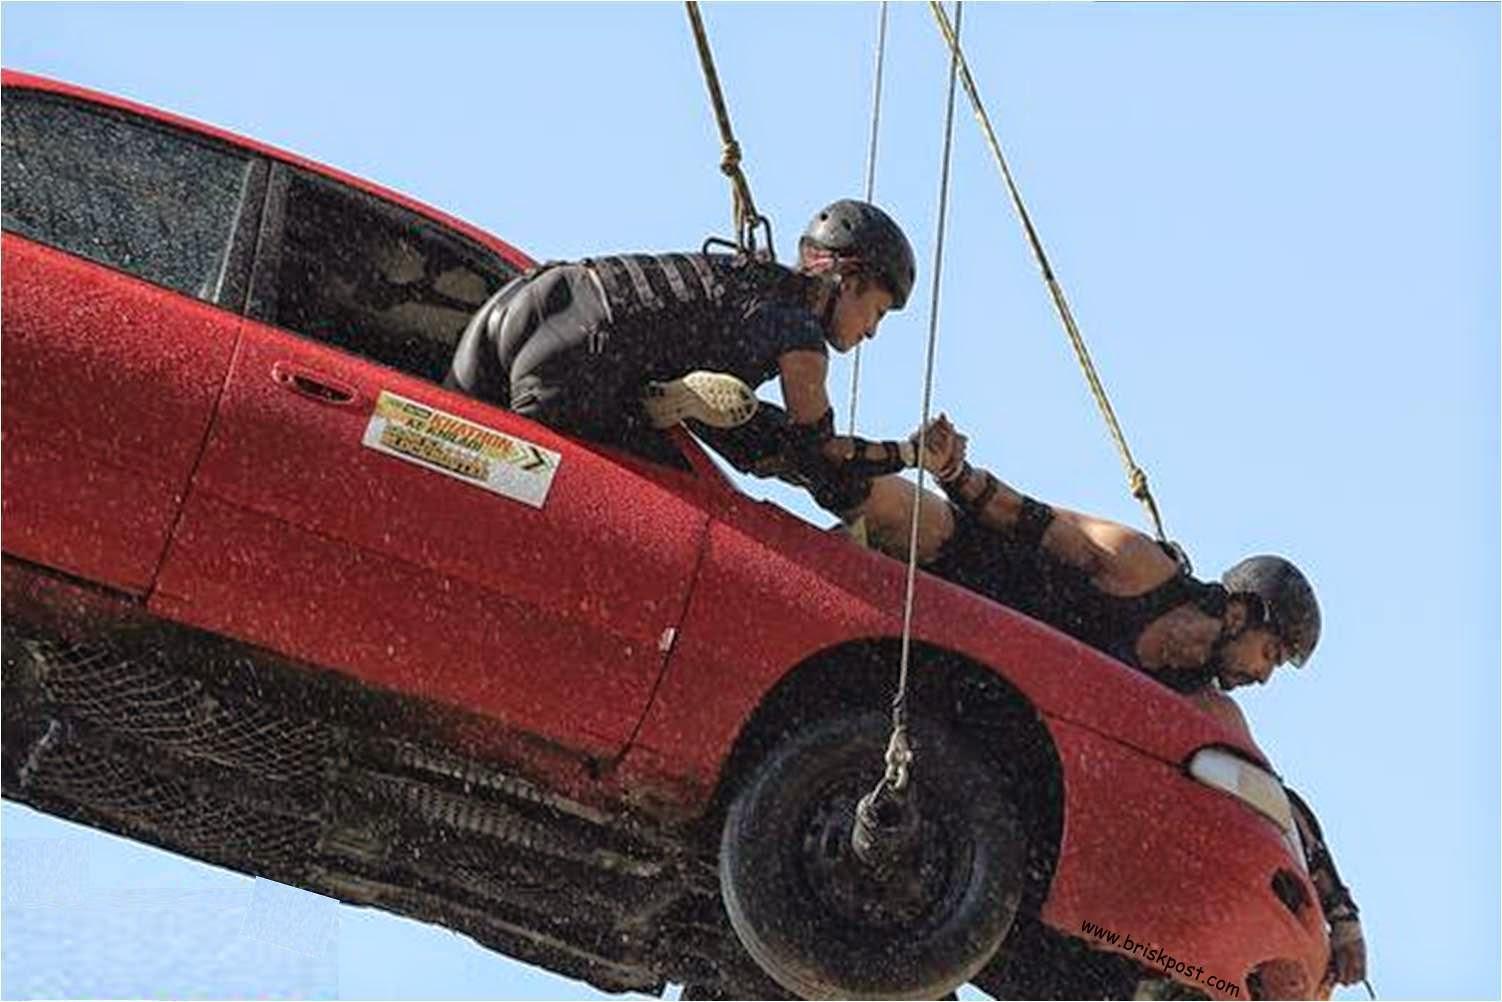 Fear Factor Khatron Ke Khiladi 5 Debina holding hand of Gurmeet while performing a height stunt on car in shower